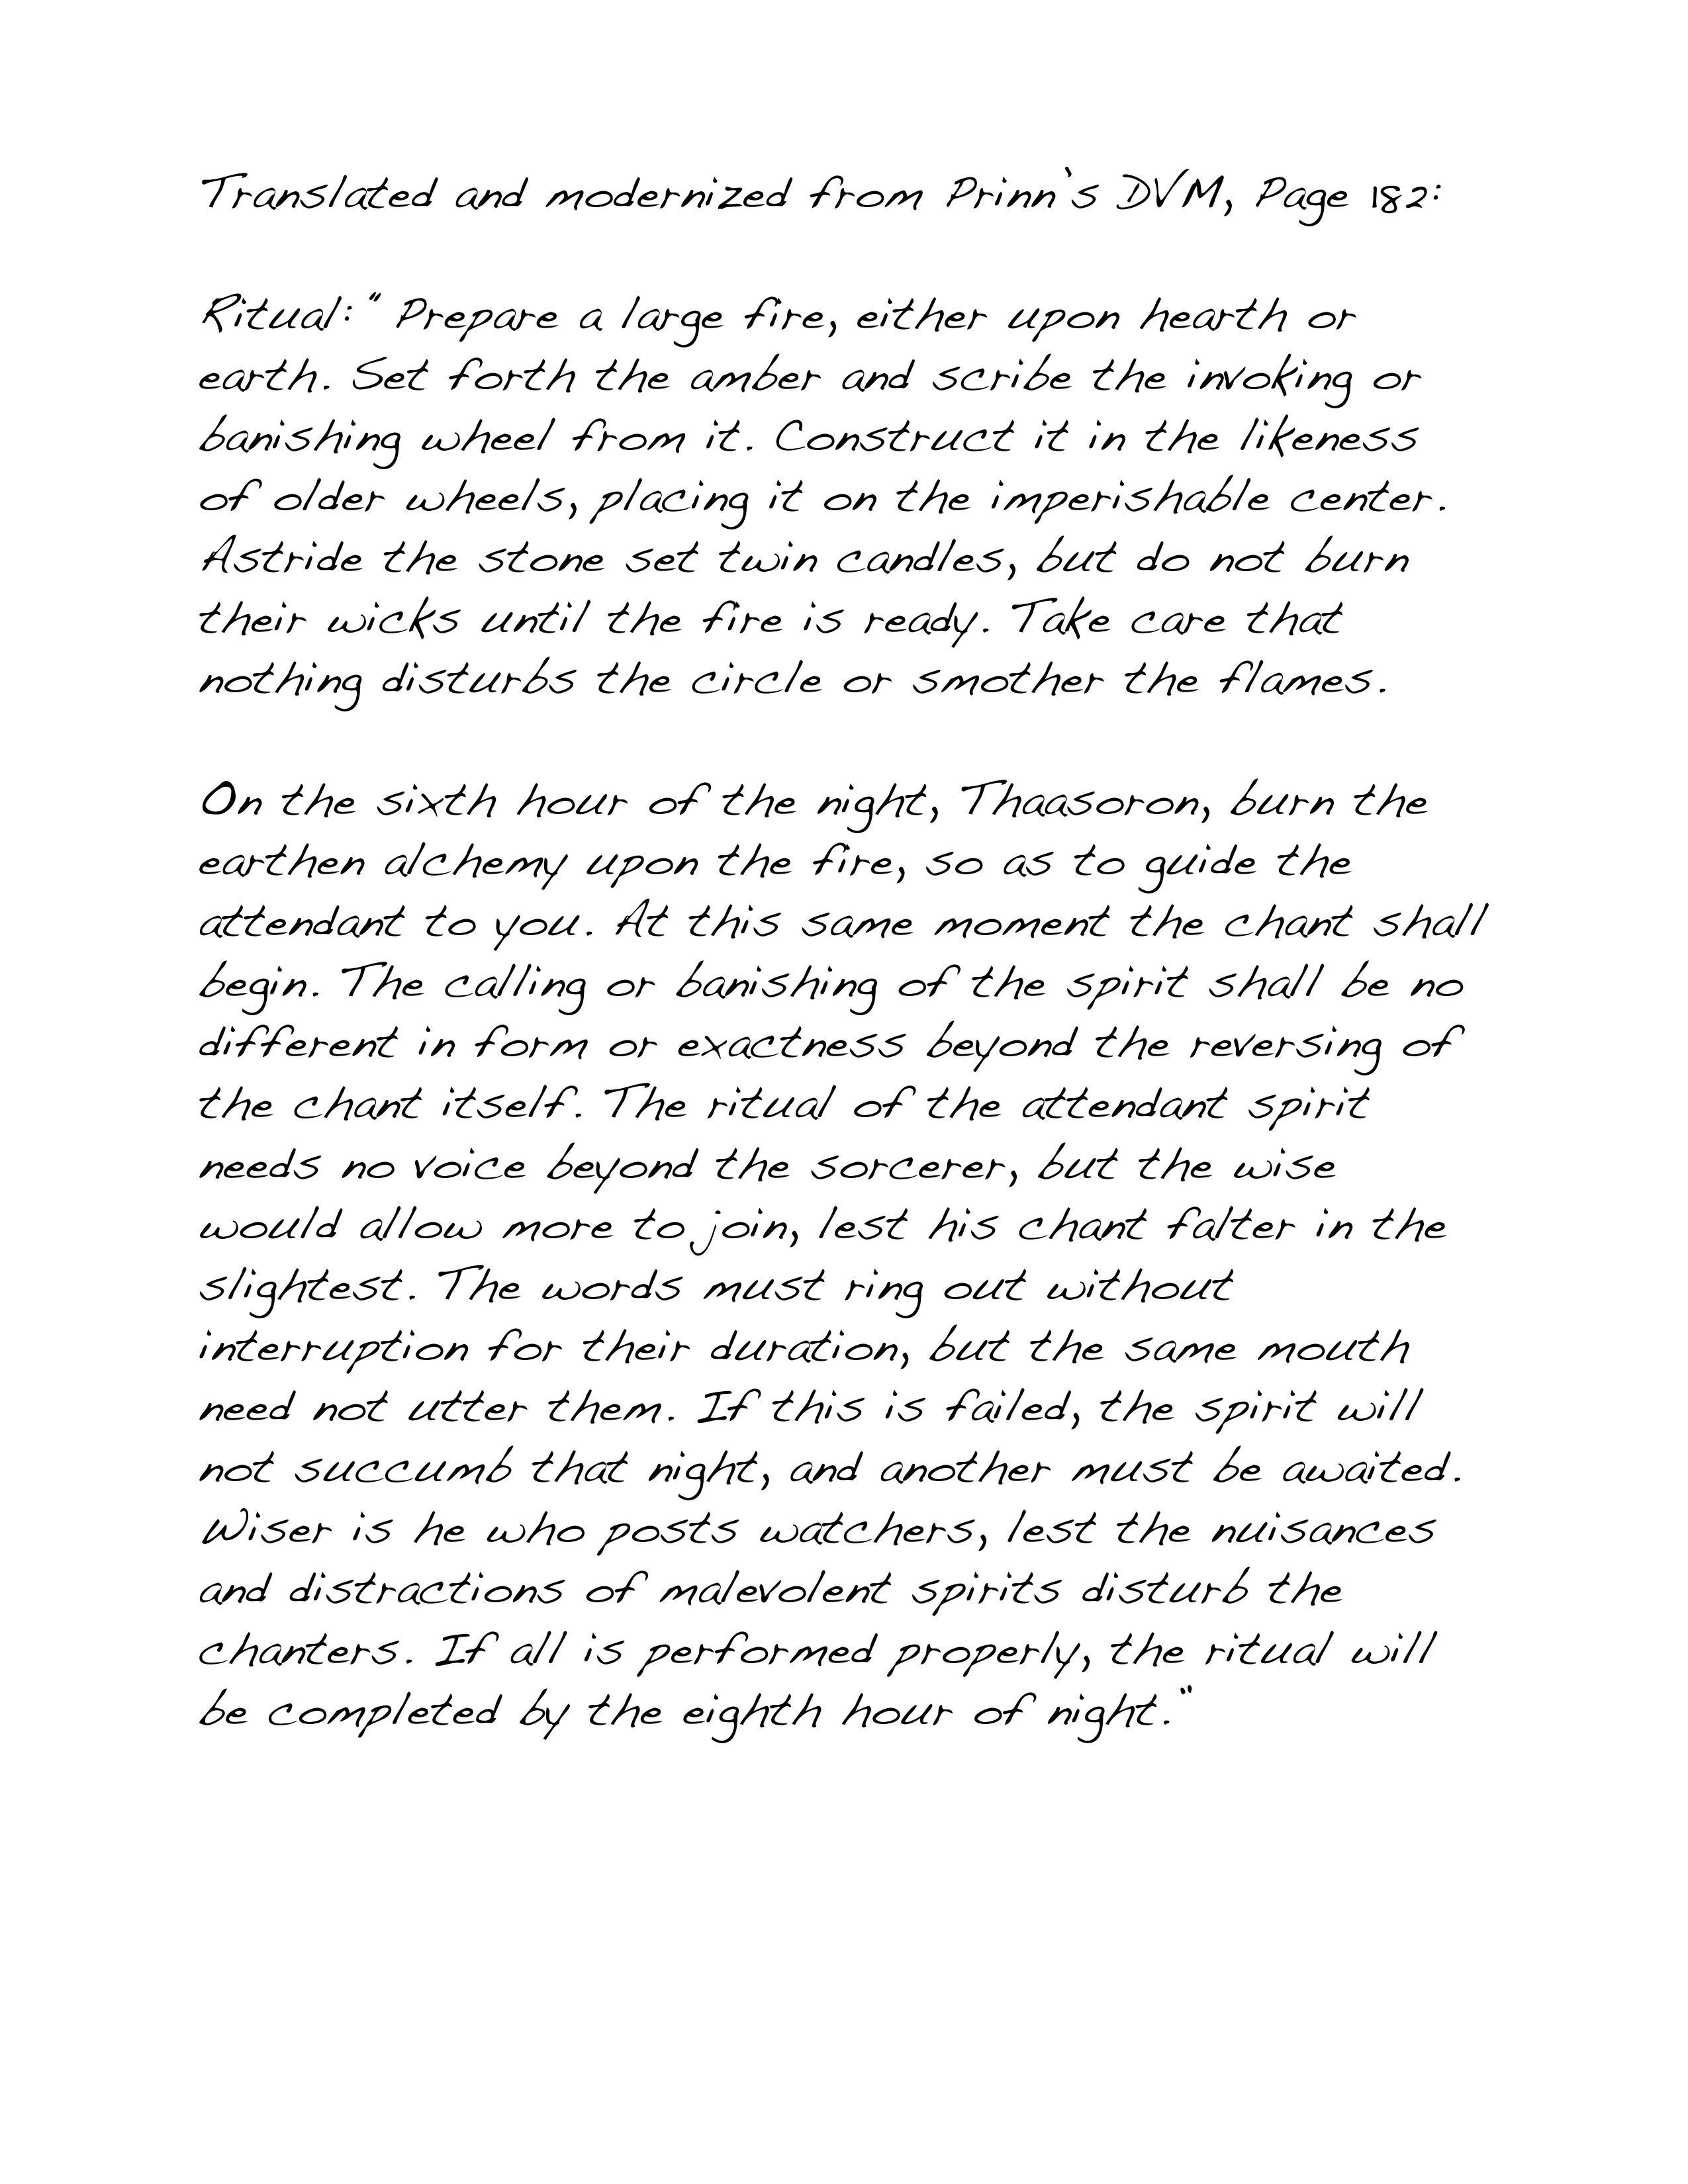 De vermis mysteriis page 4